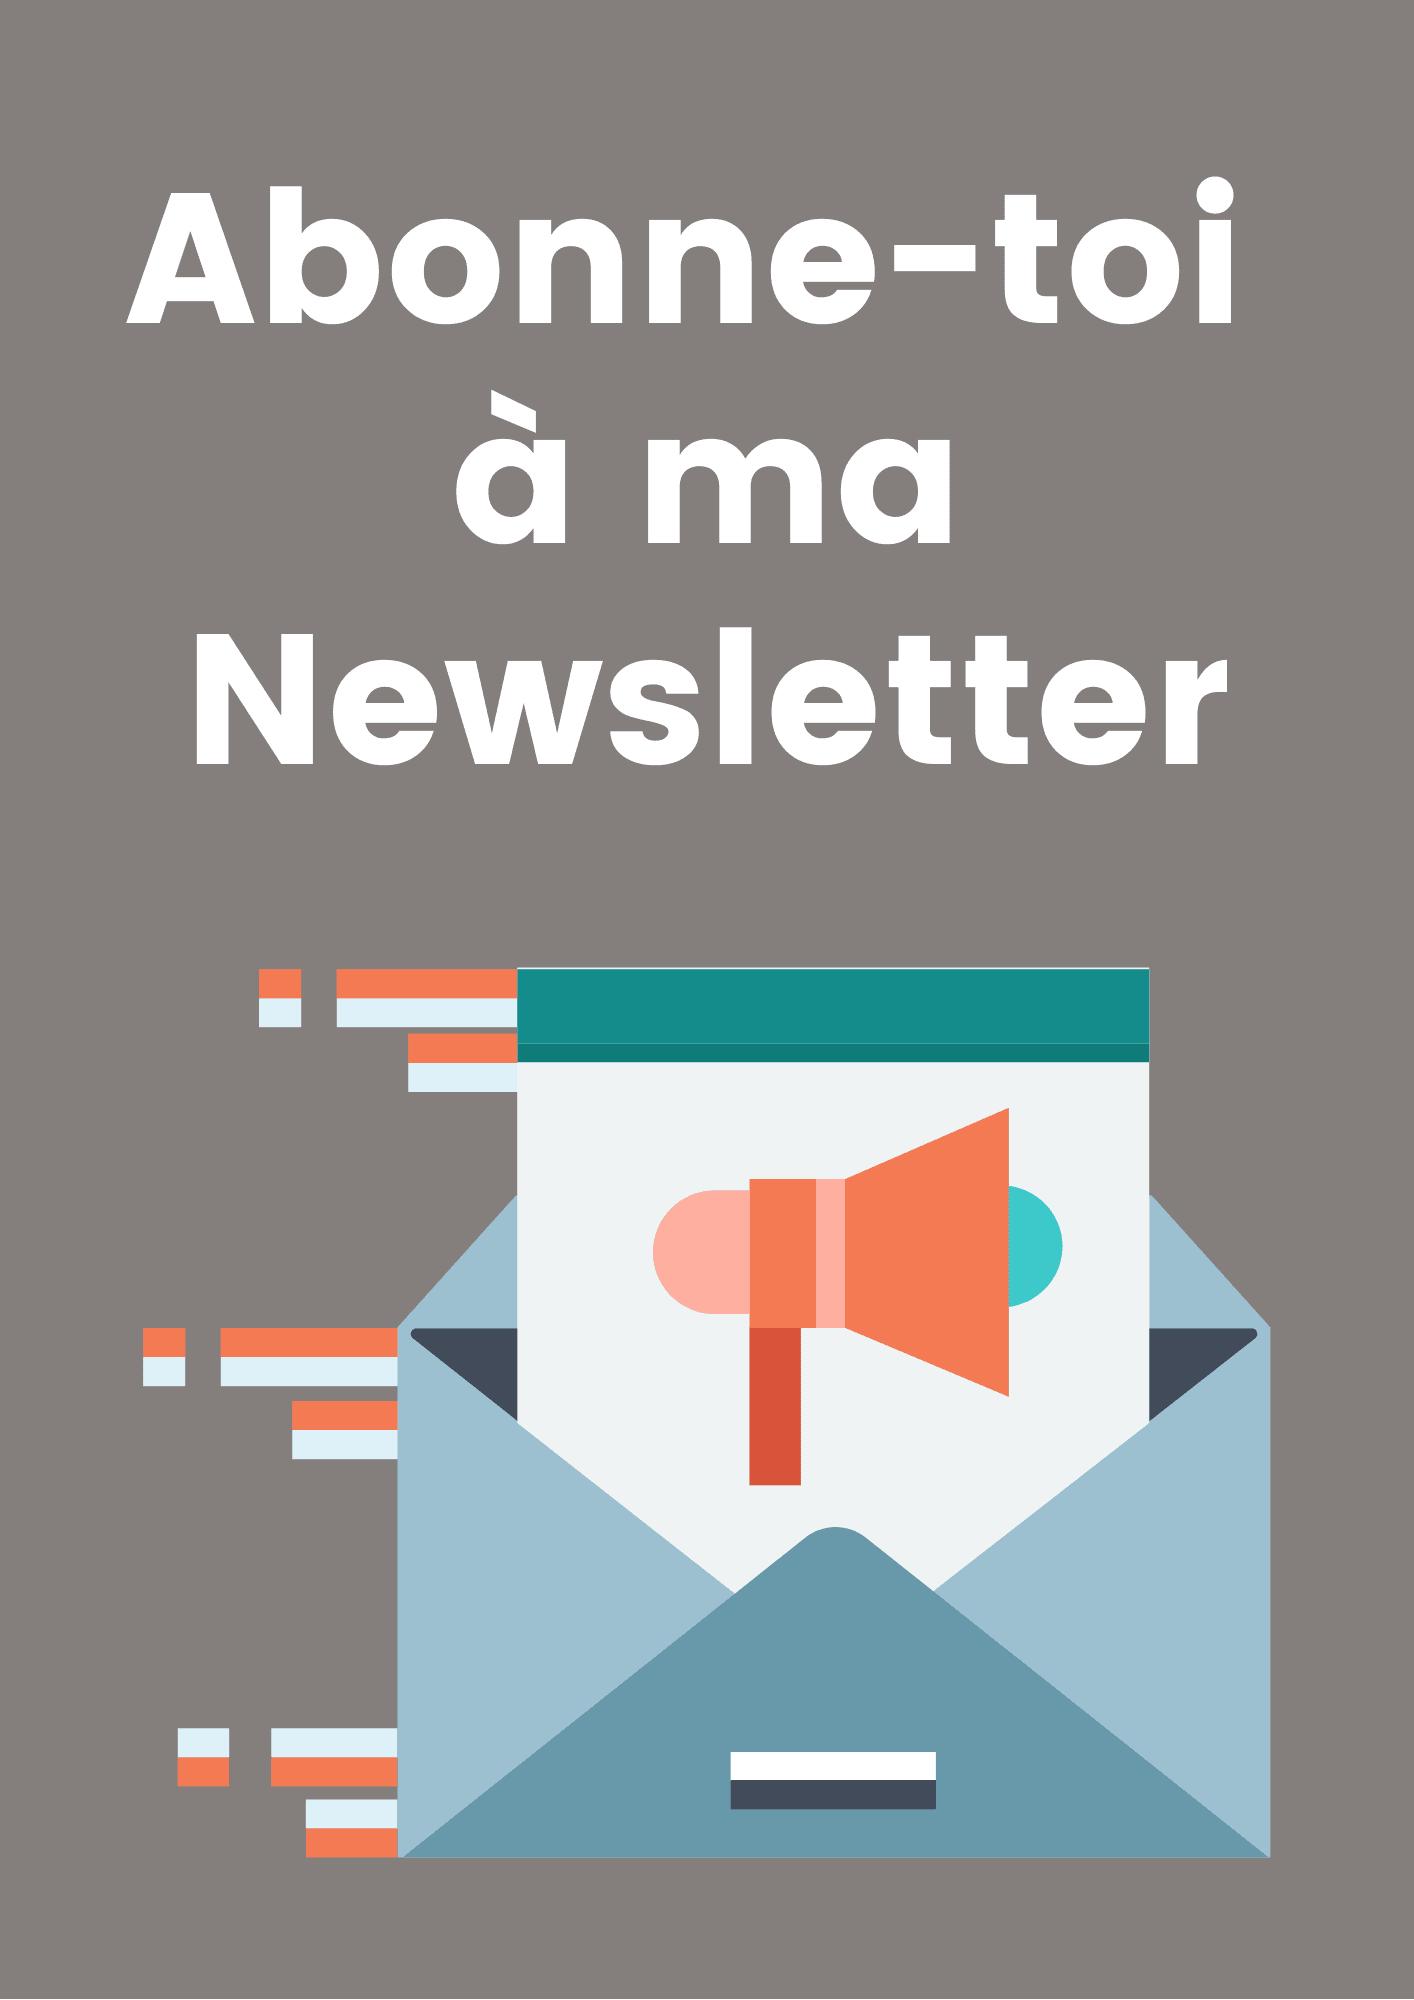 Abonne-toi à ma Newsletter